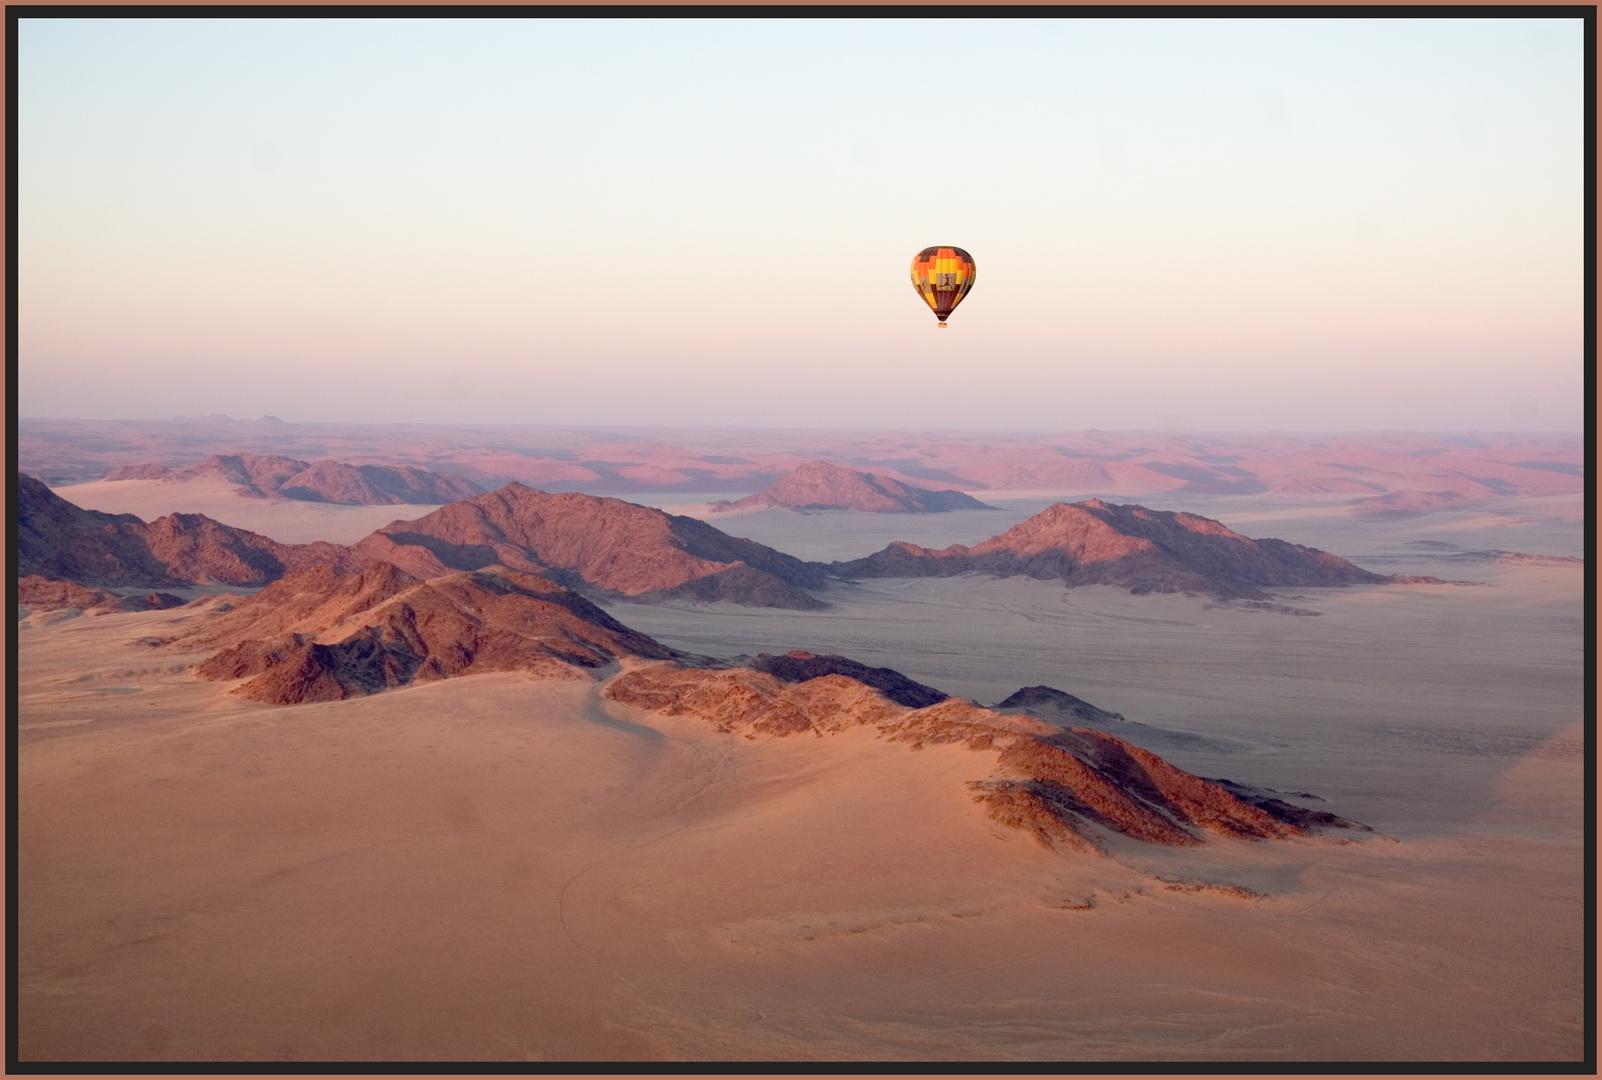 Mit dem Ballon über die Namib am Tsauchab entlang